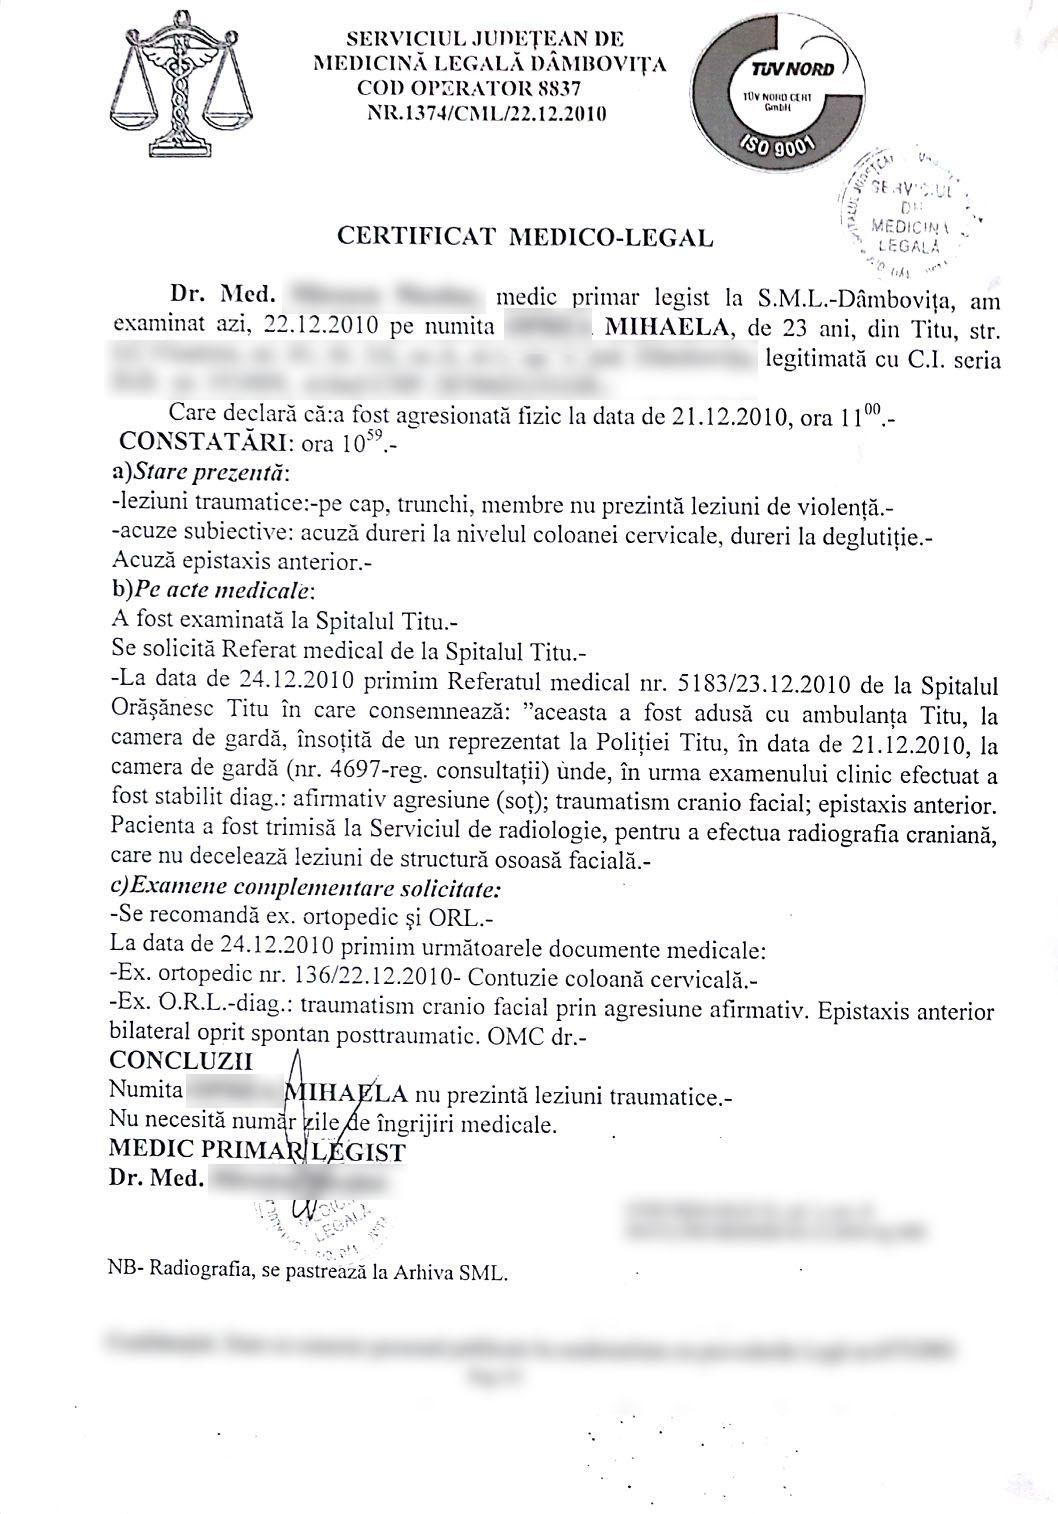 certificat medico-legal caz ofiter MApN